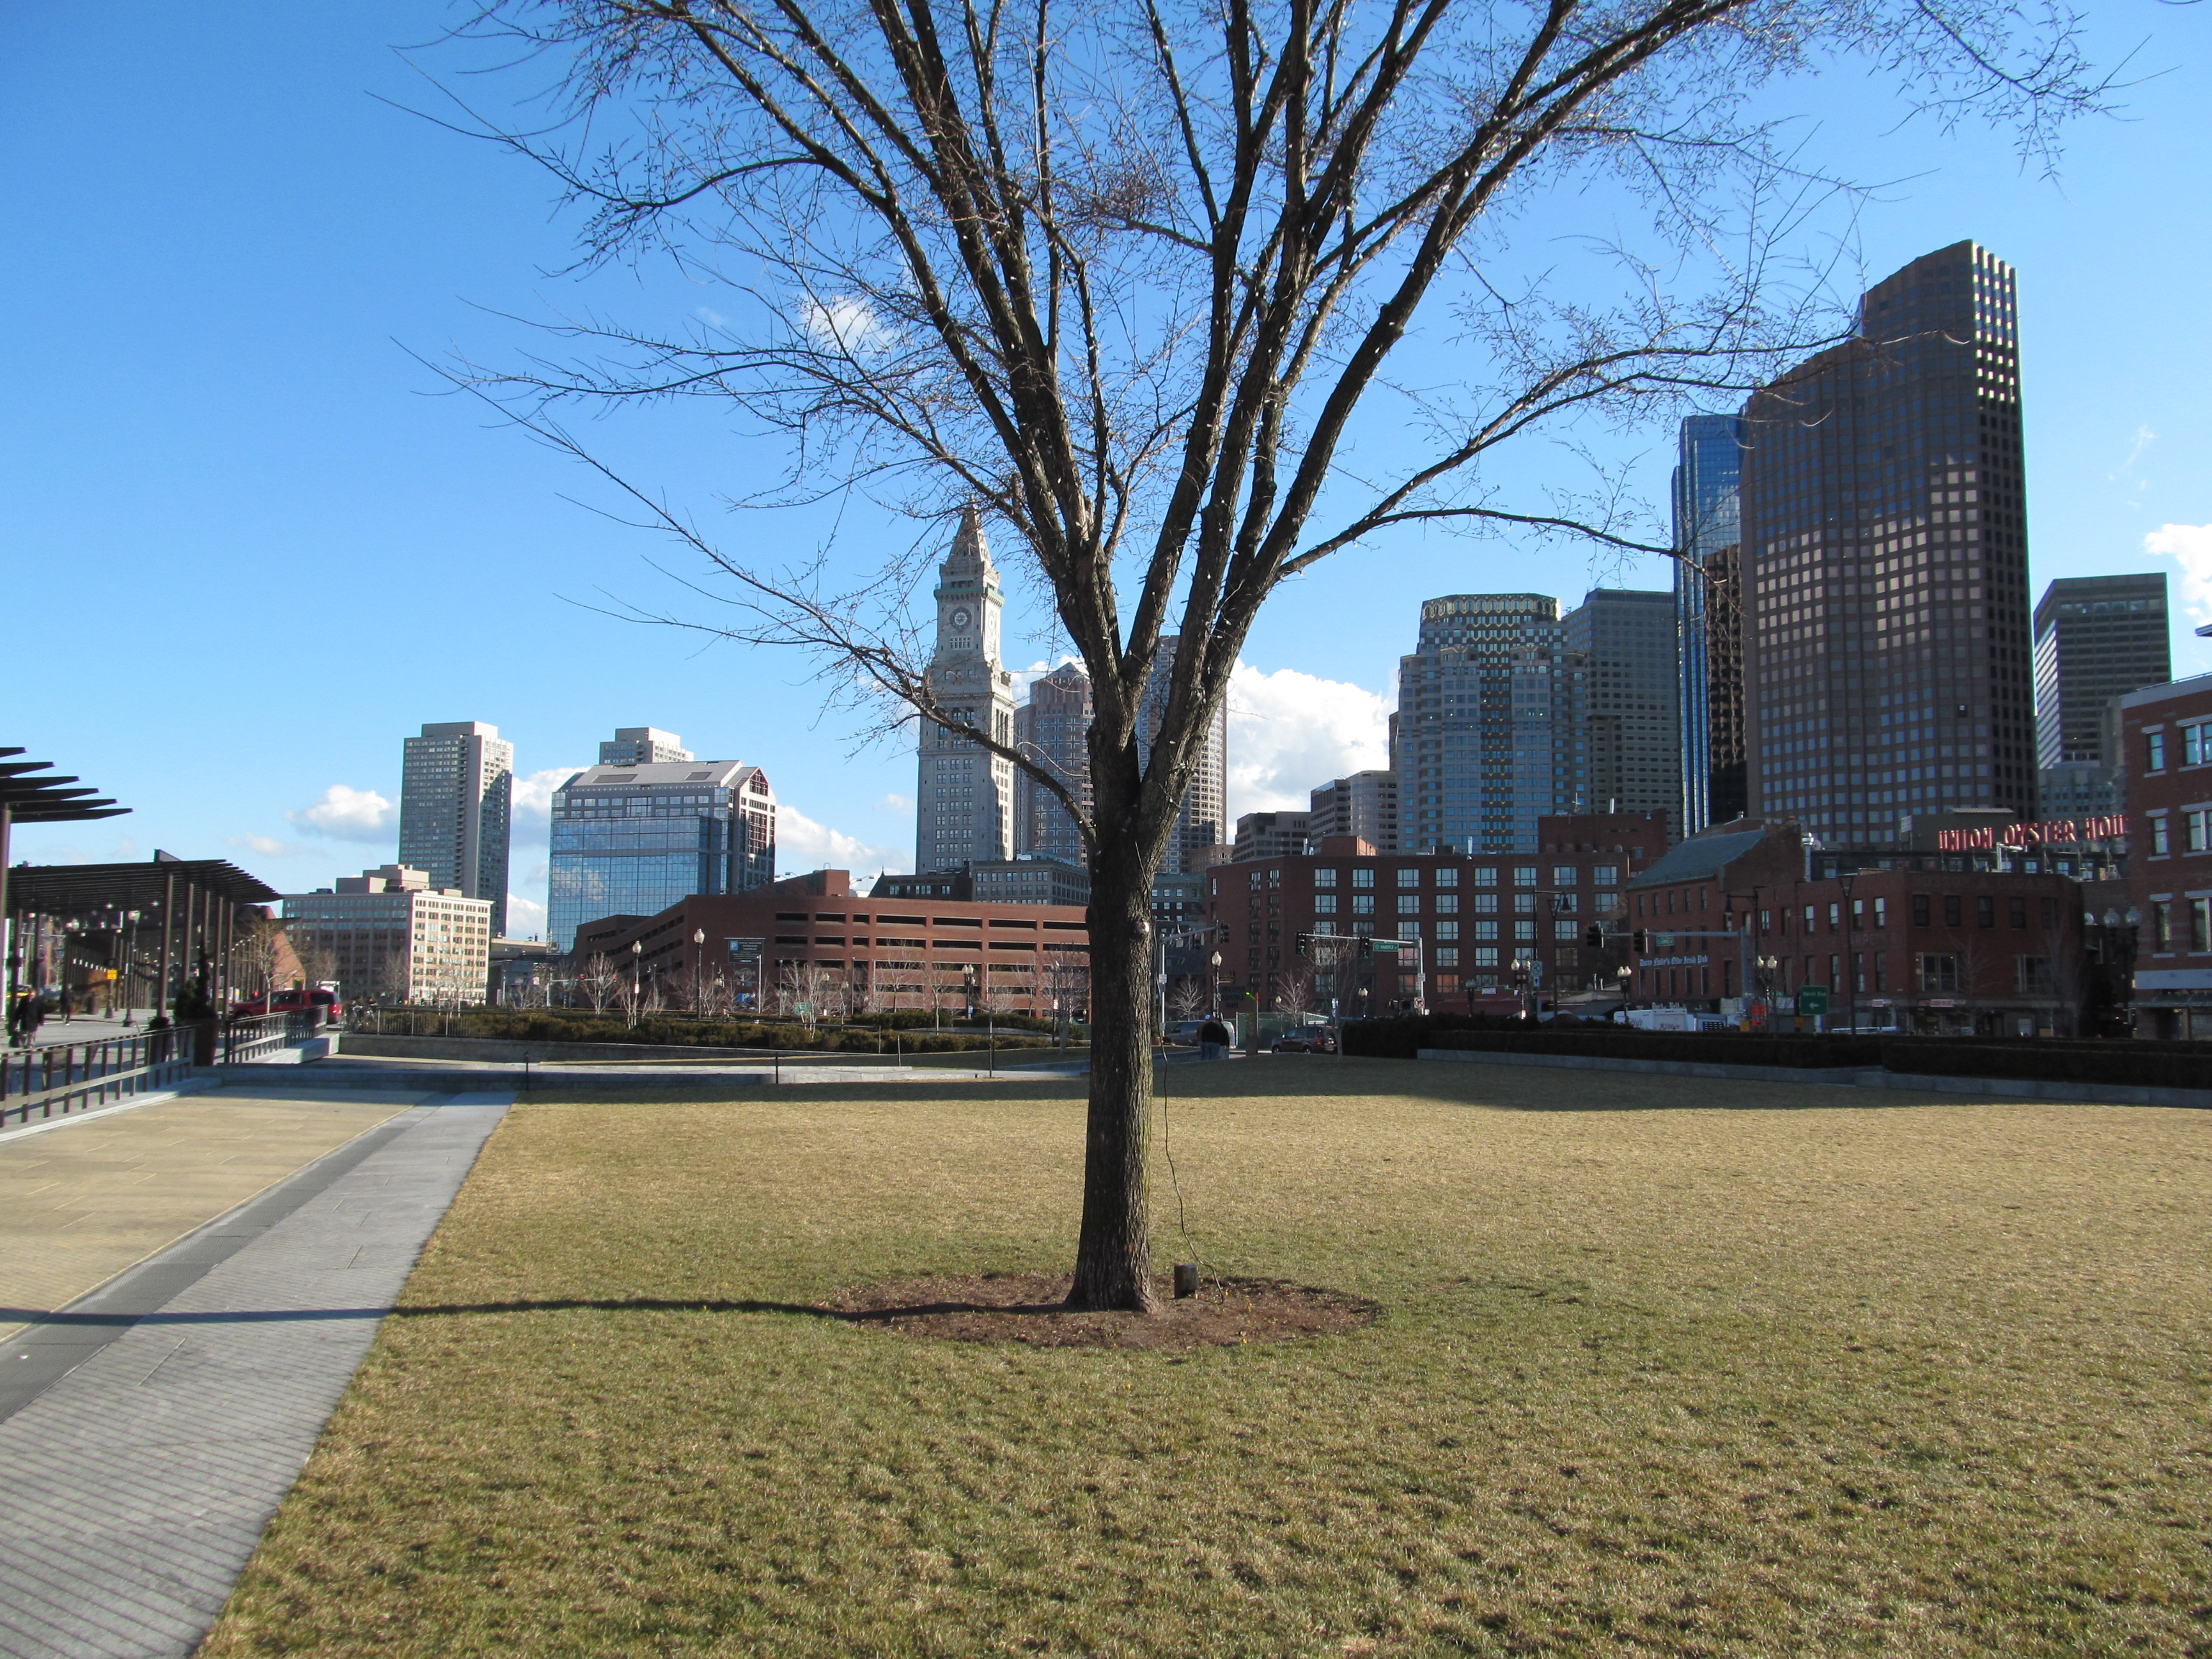 File:North End Park at Haymarket Square, Boston MA.jpg